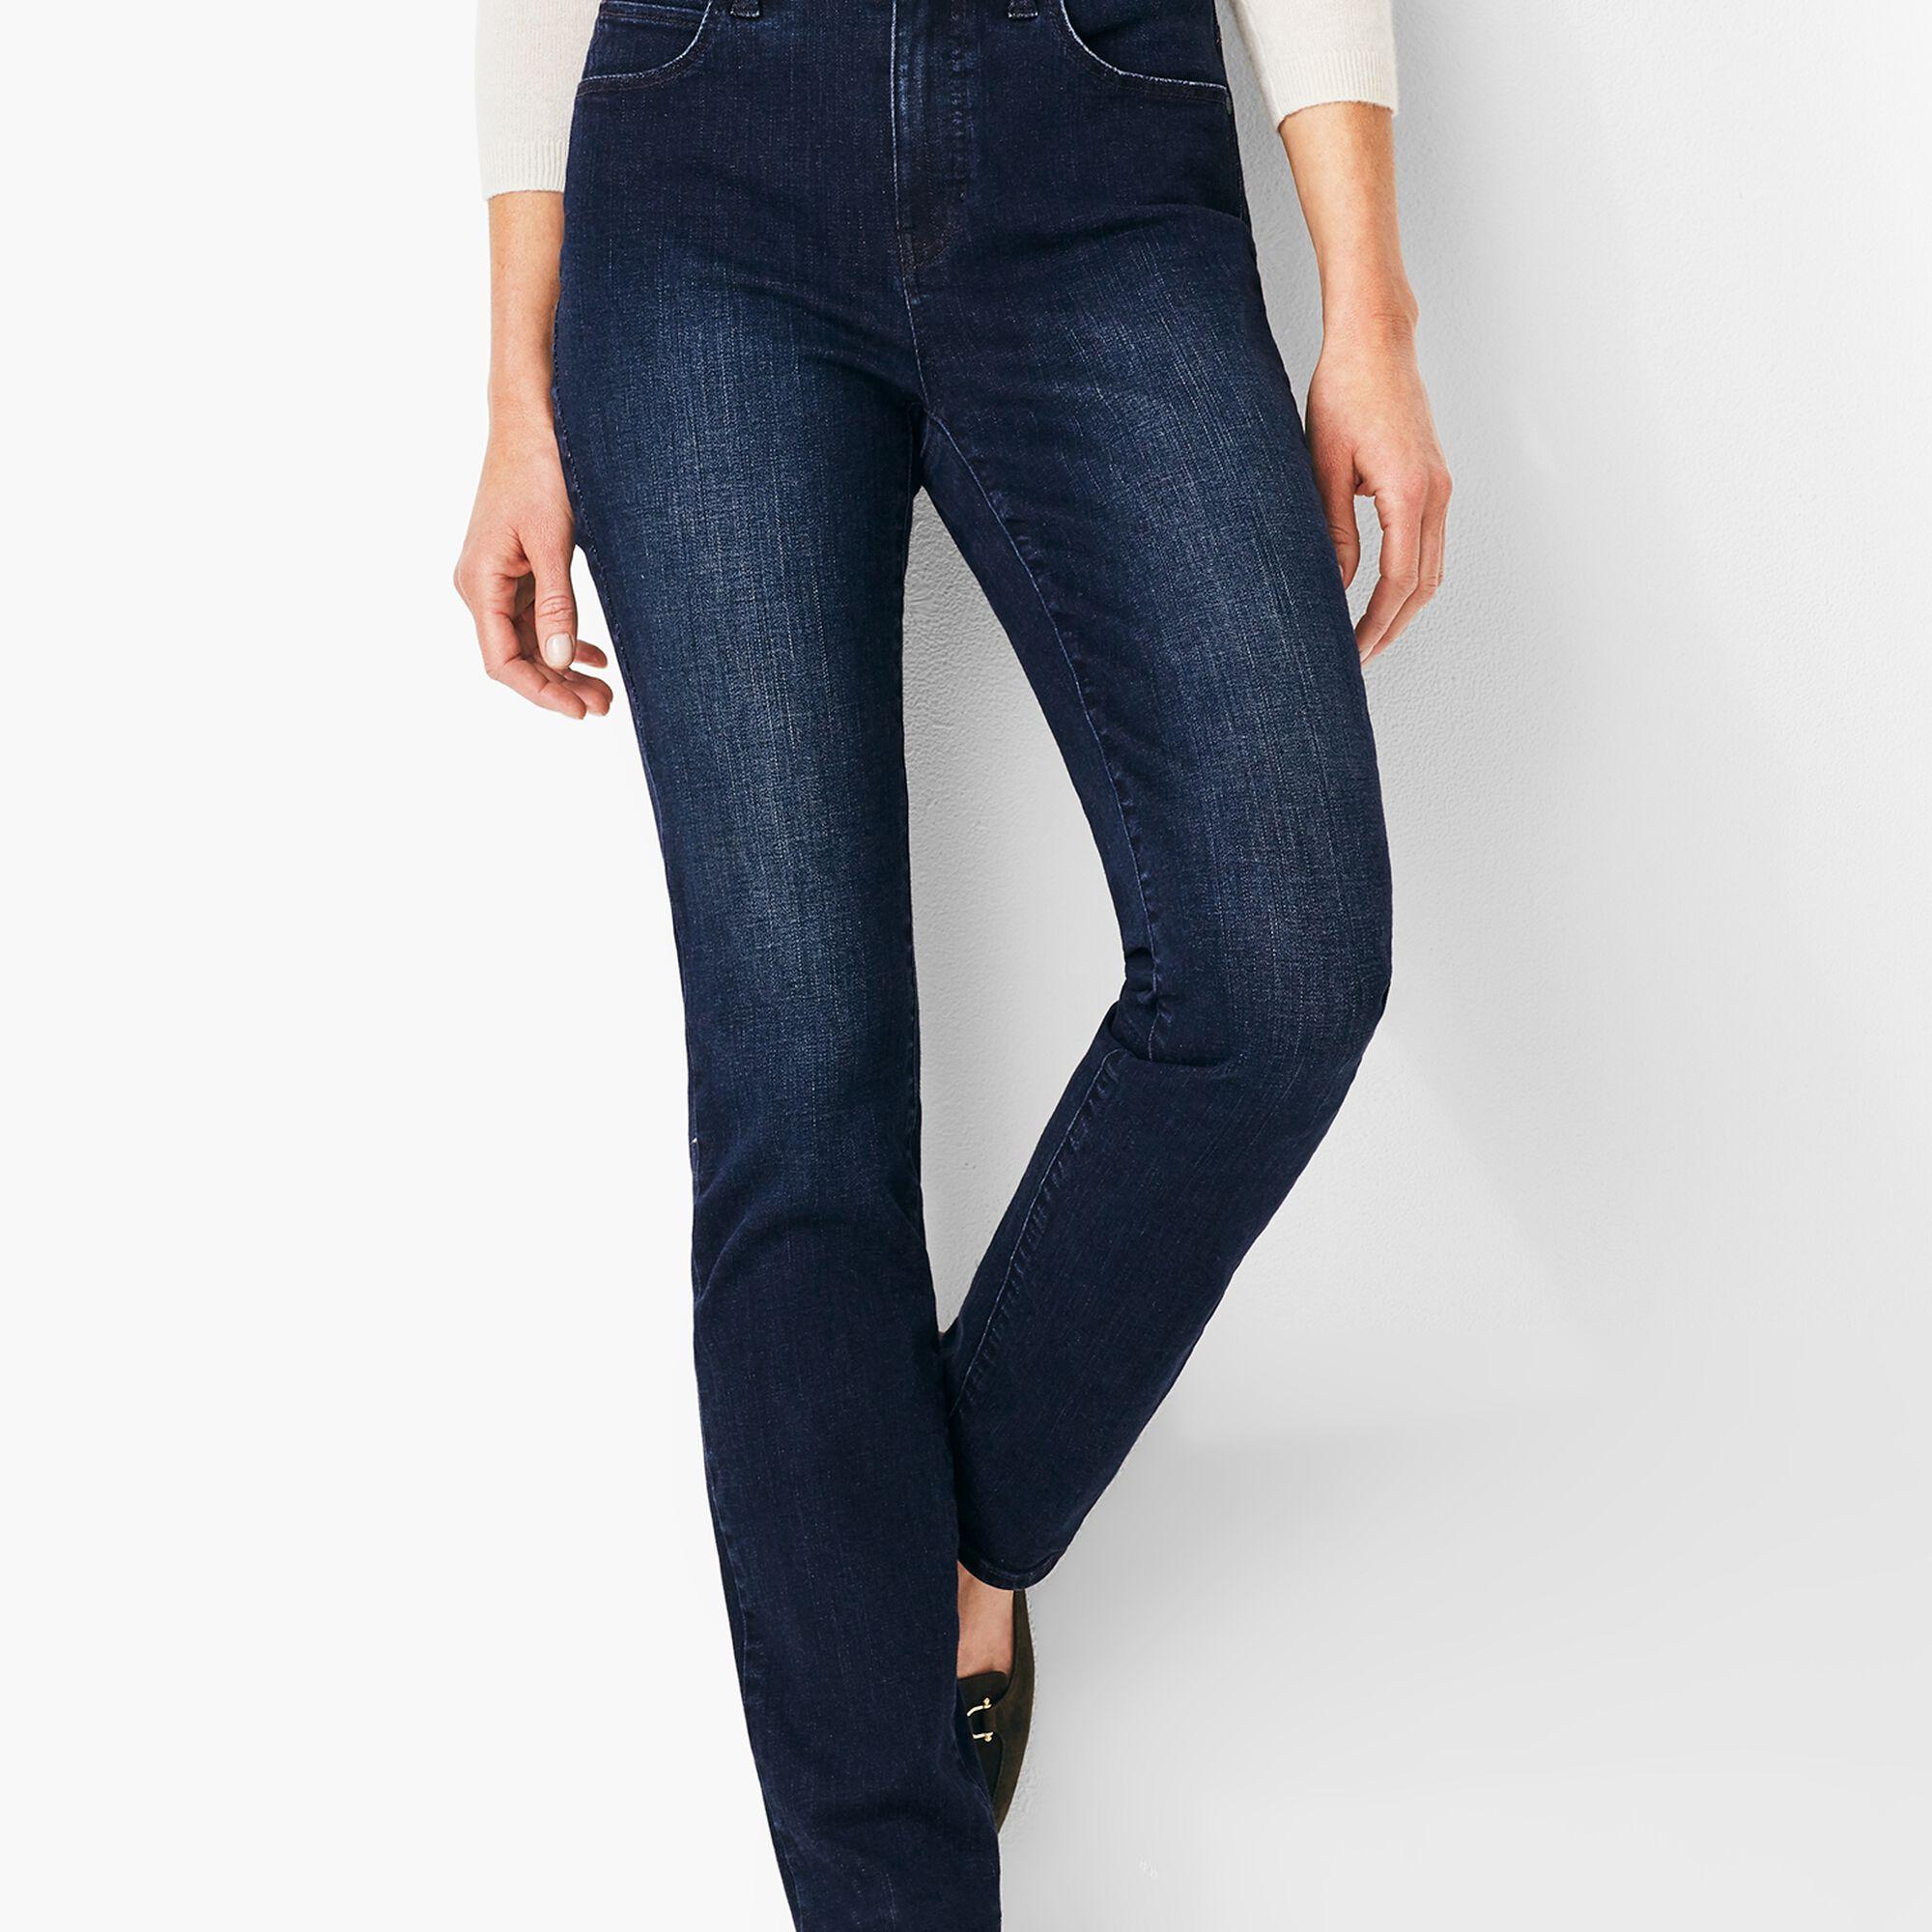 7a9a663b3 High-Waist Straight-Leg Jeans - Marco Wash Opens a New Window.